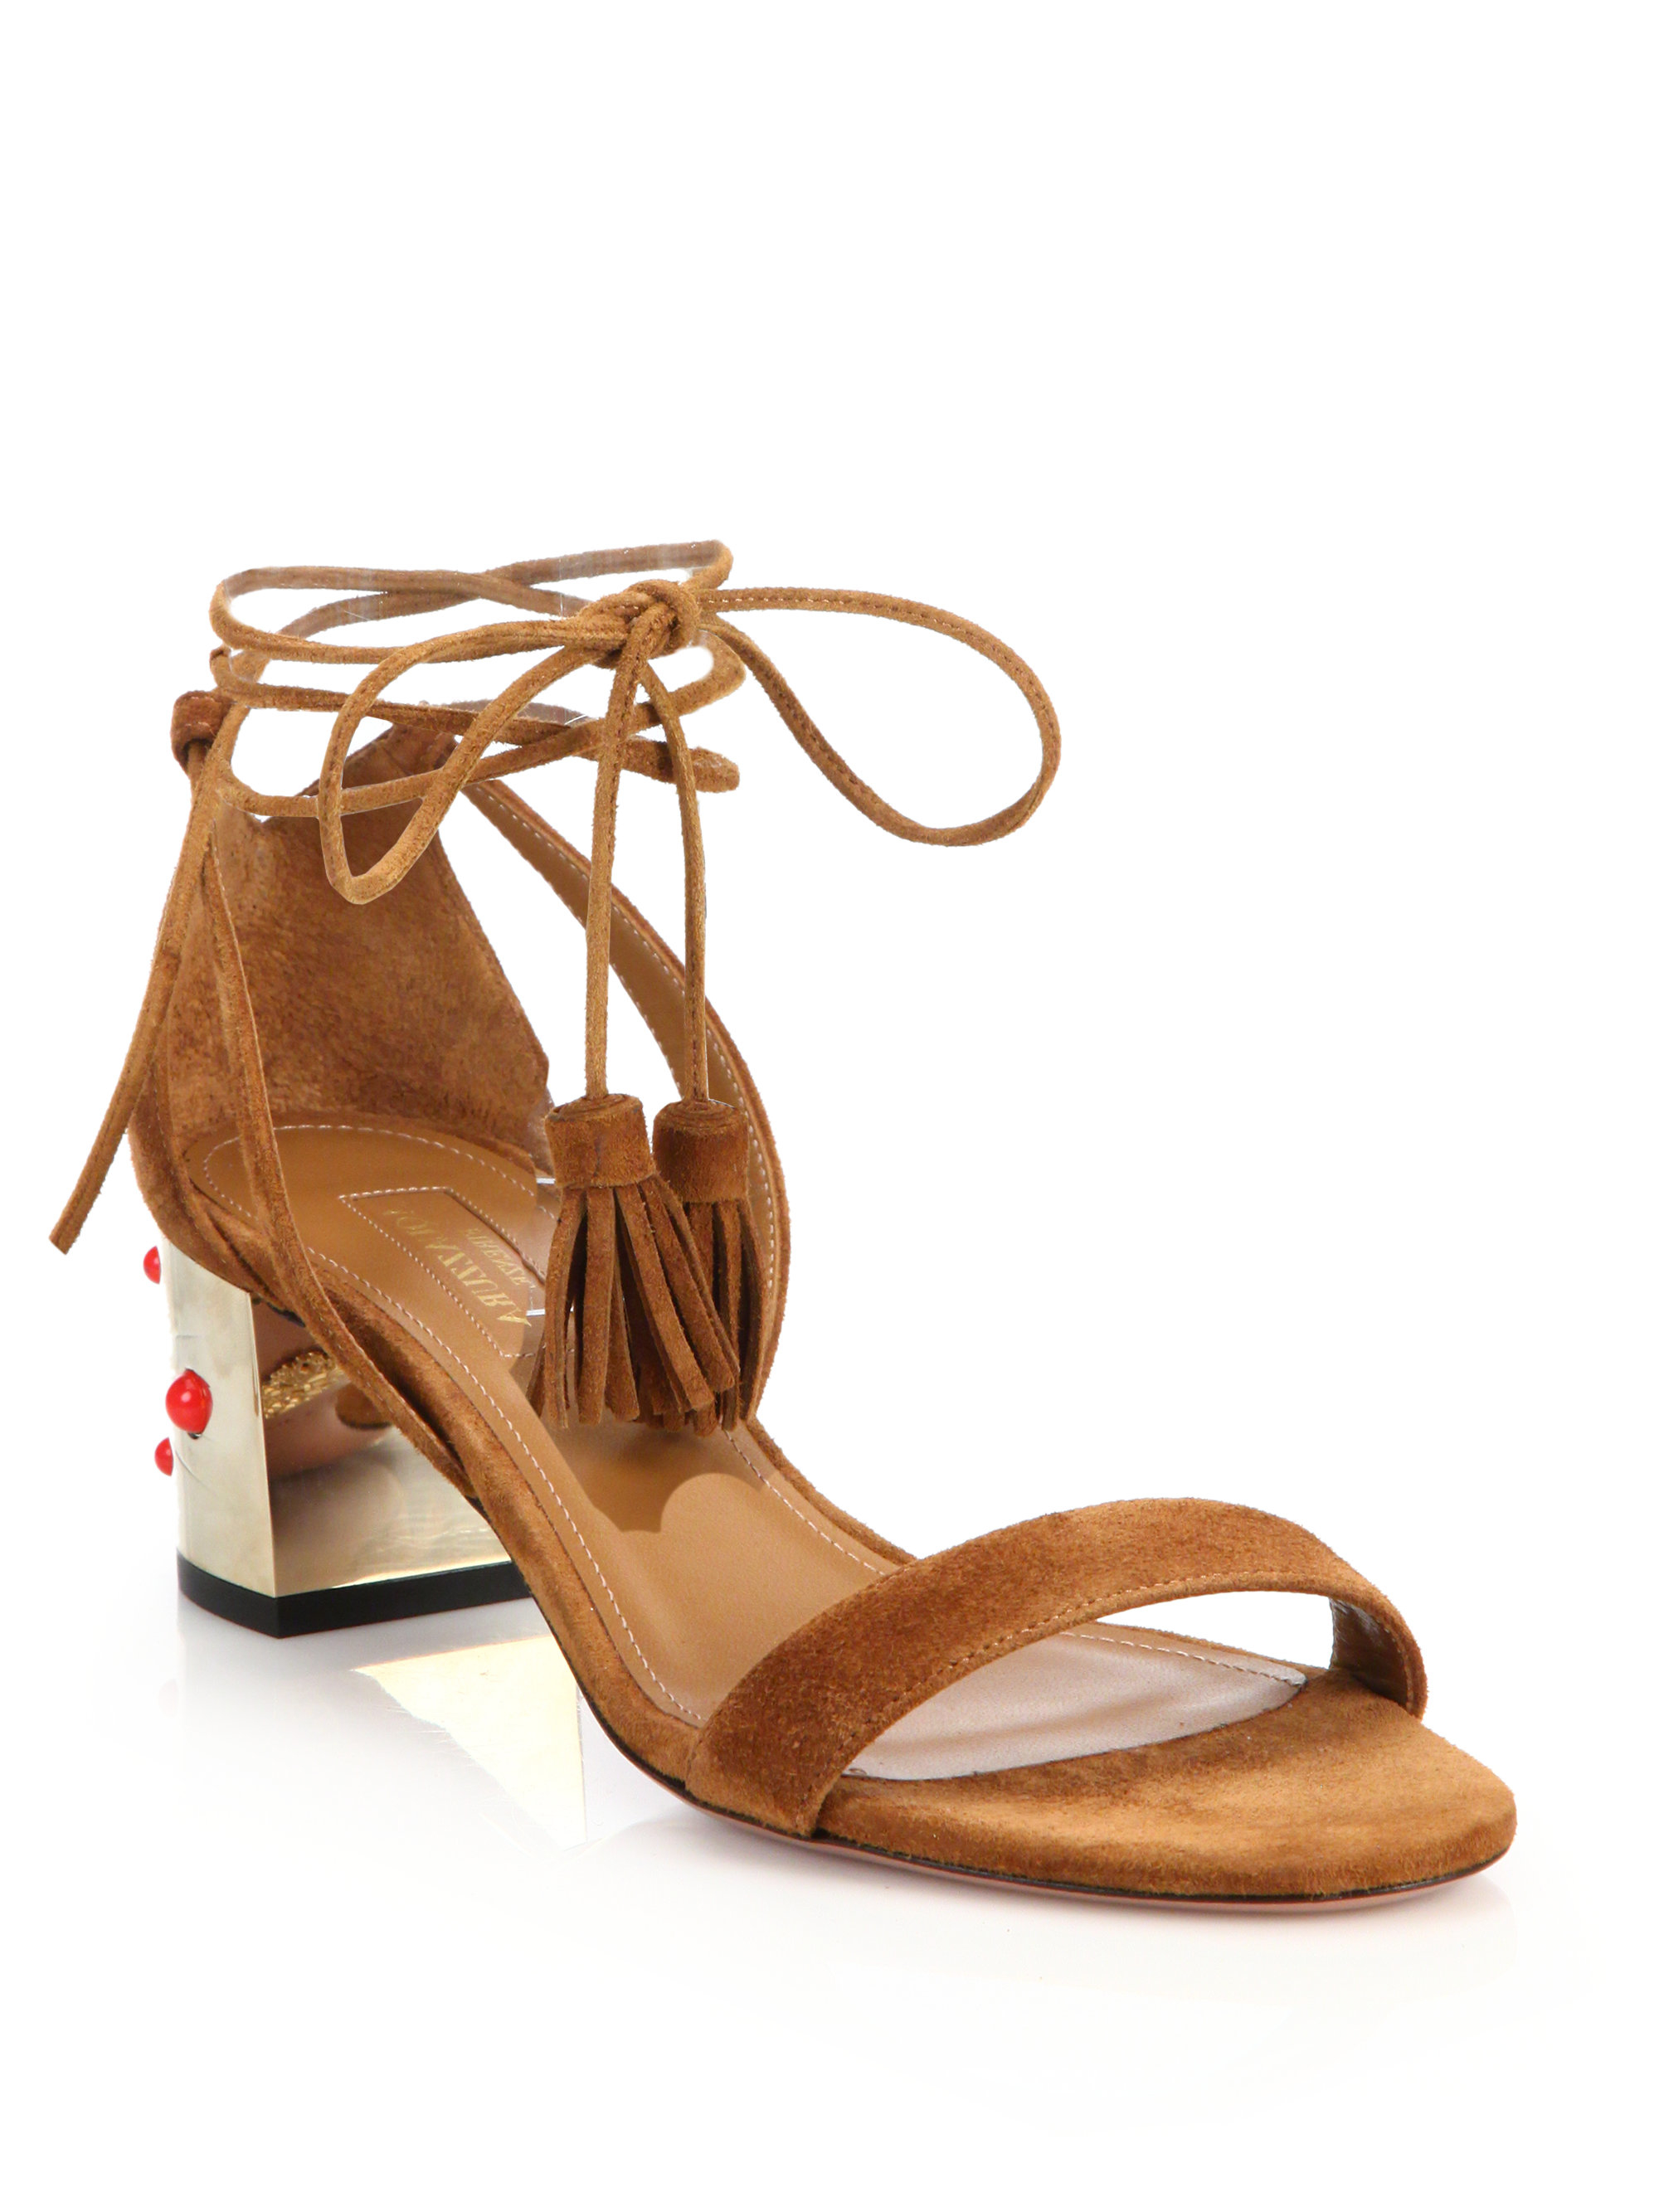 Lyst Aquazzura Cleopatra Sandals In Brown